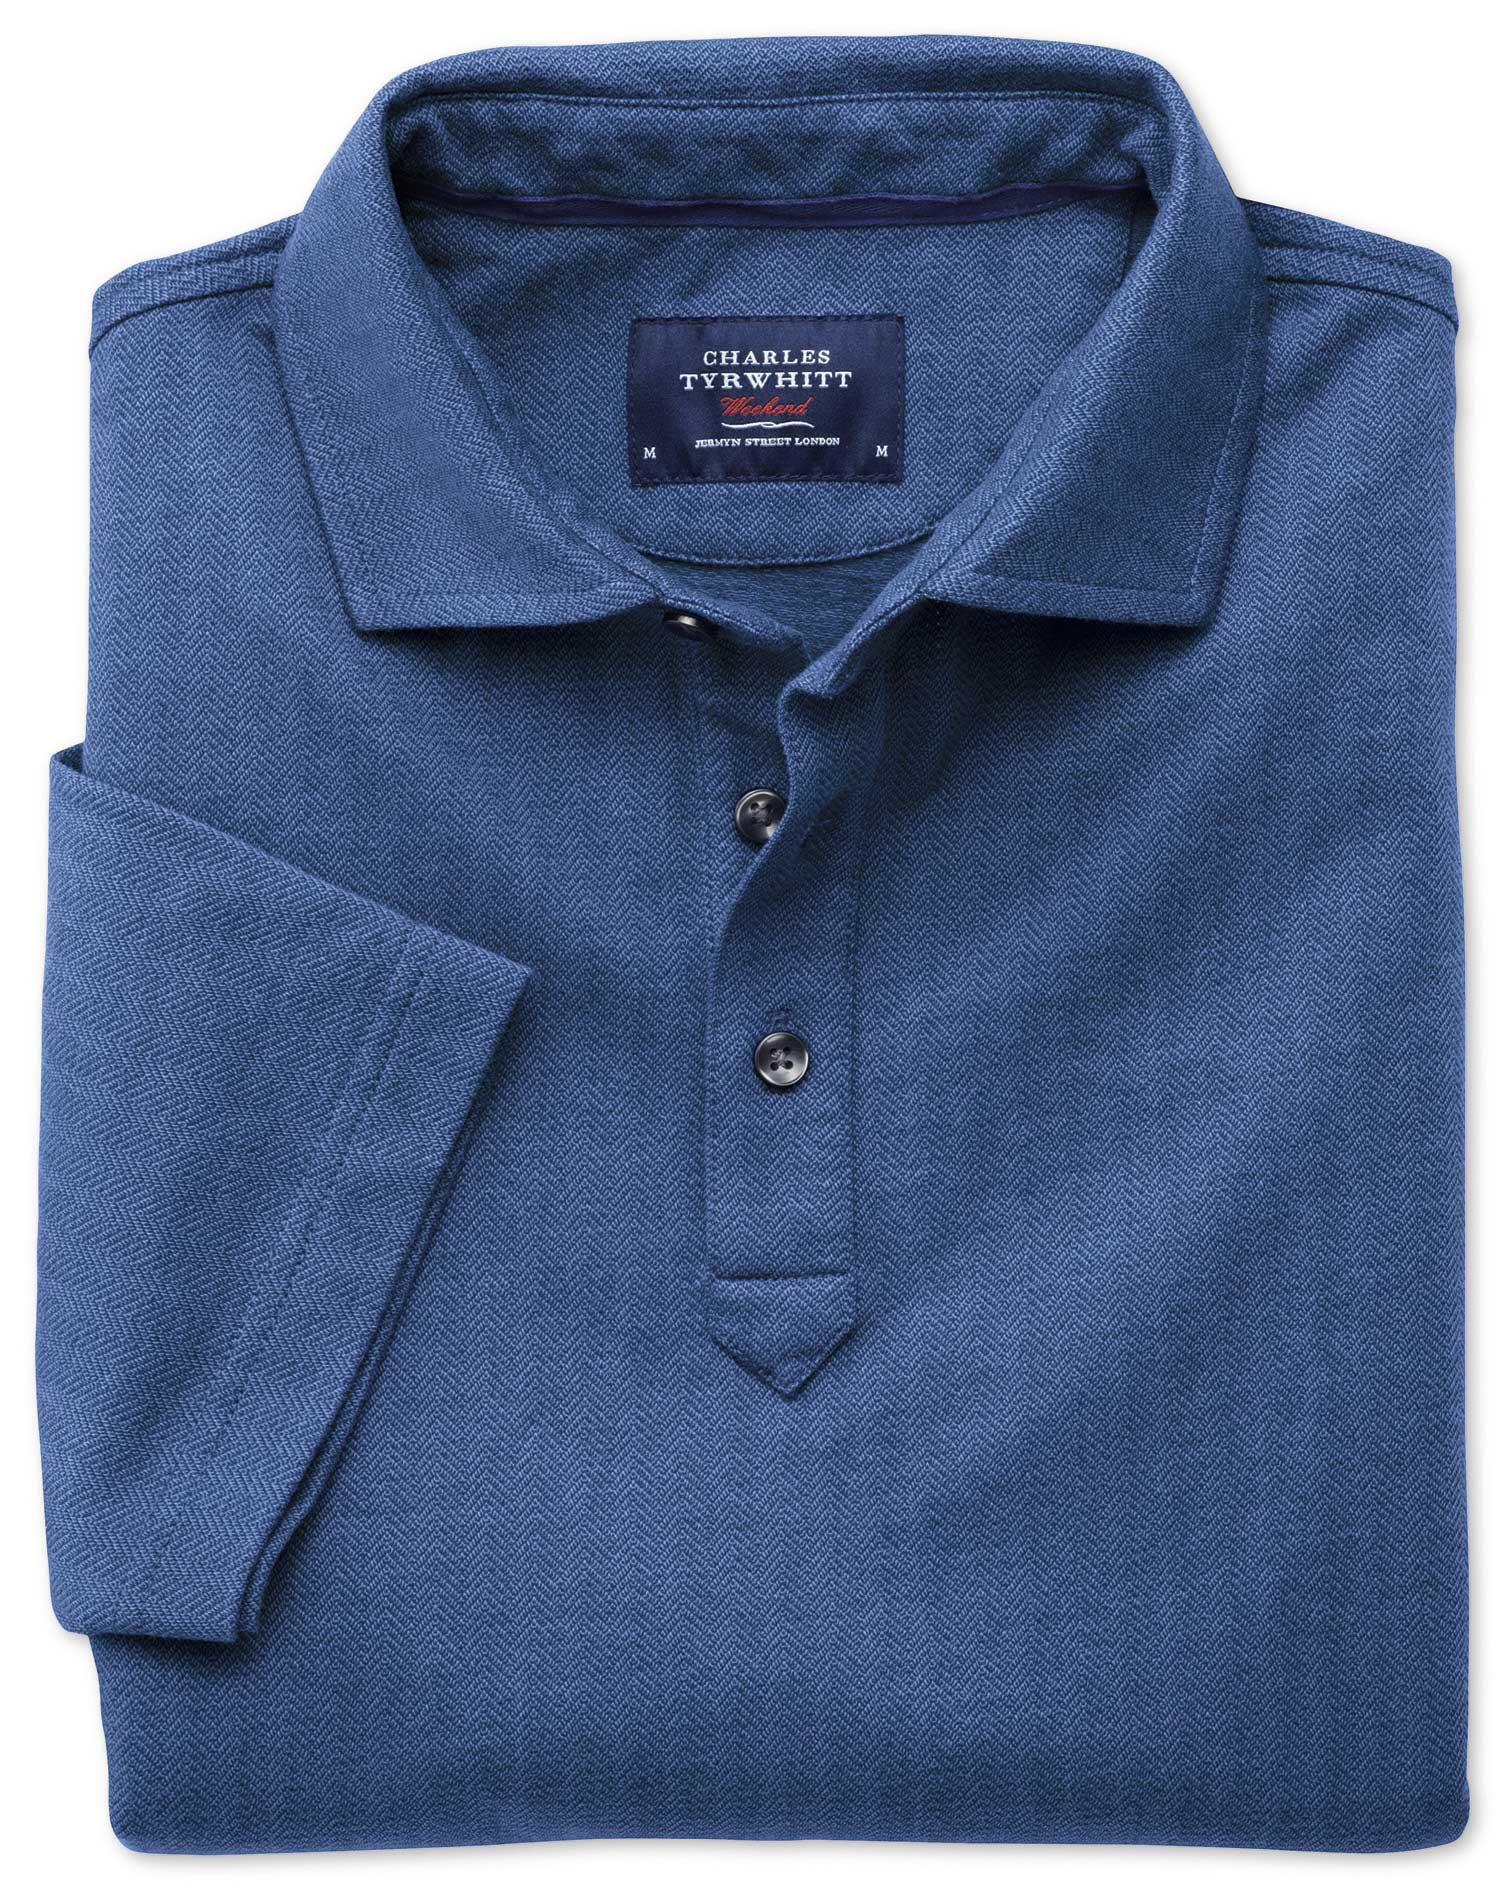 Blue Herringbone Cotton Polo Size Large by Charles Tyrwhitt